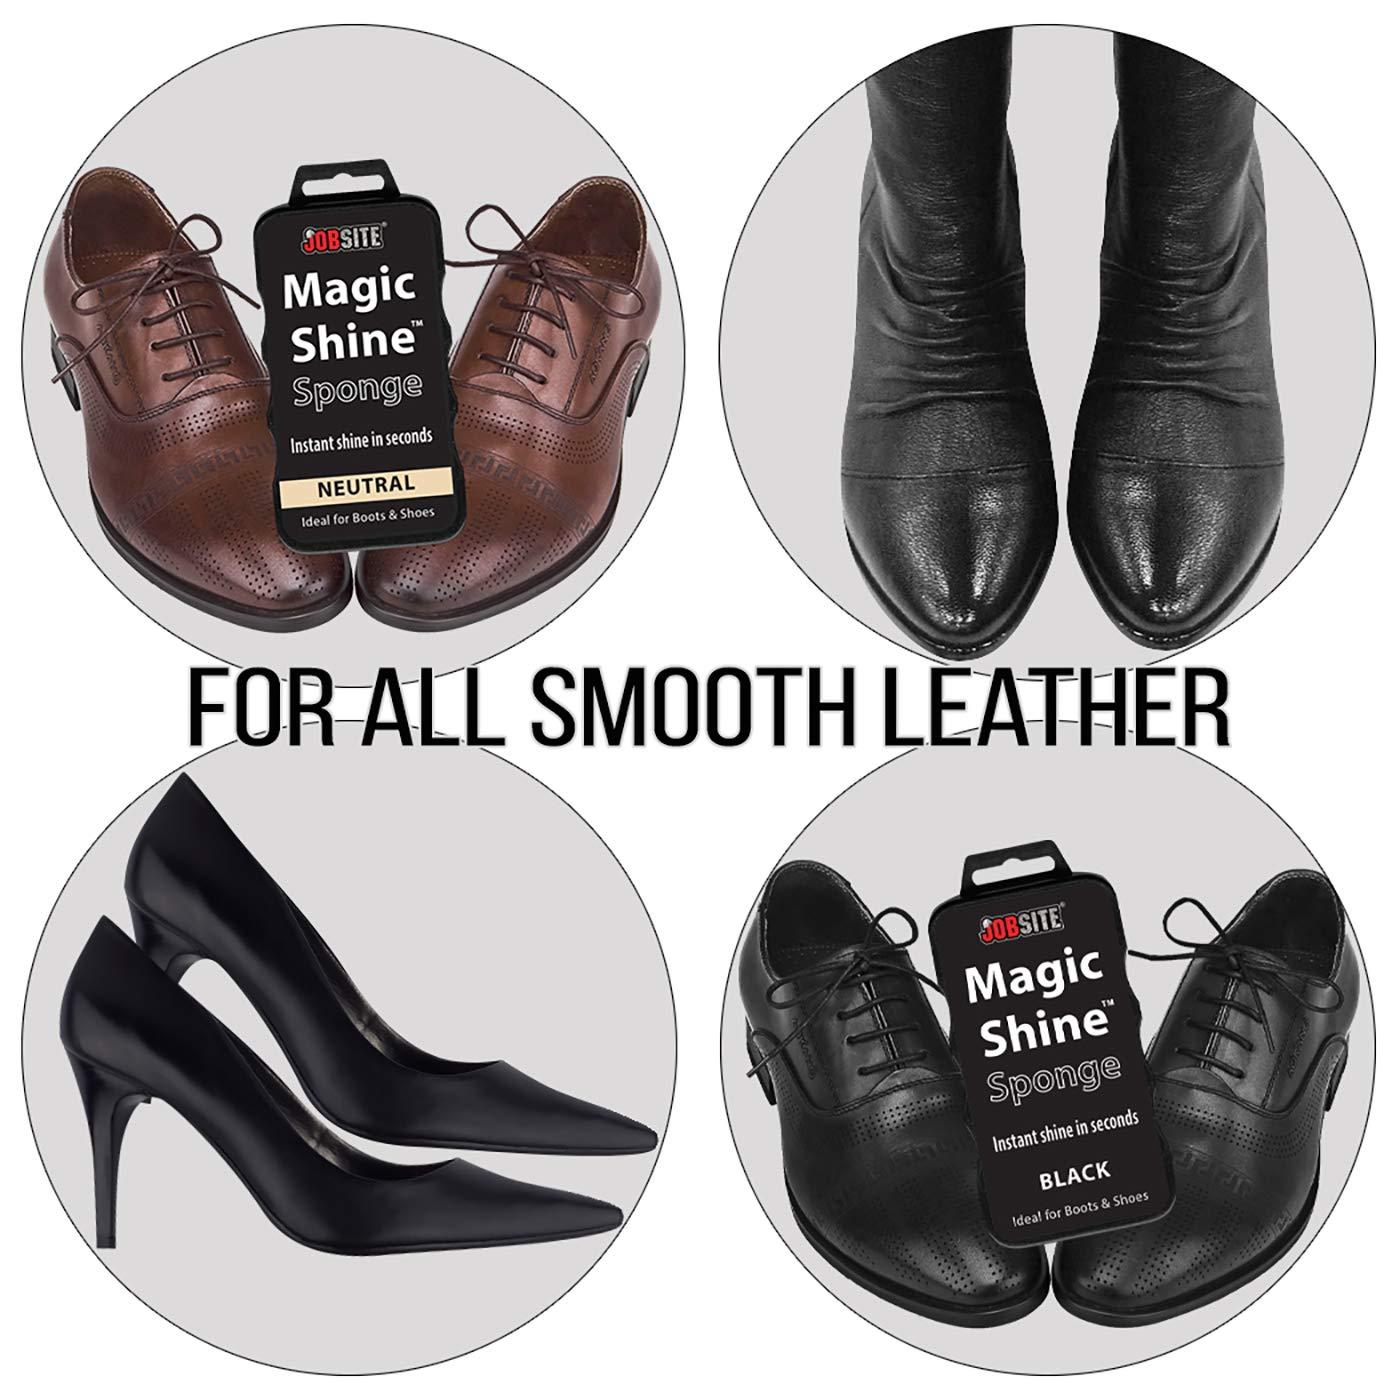 JOB SITE Instant Express Leather Boot /& Shoe Shine Sponge Black